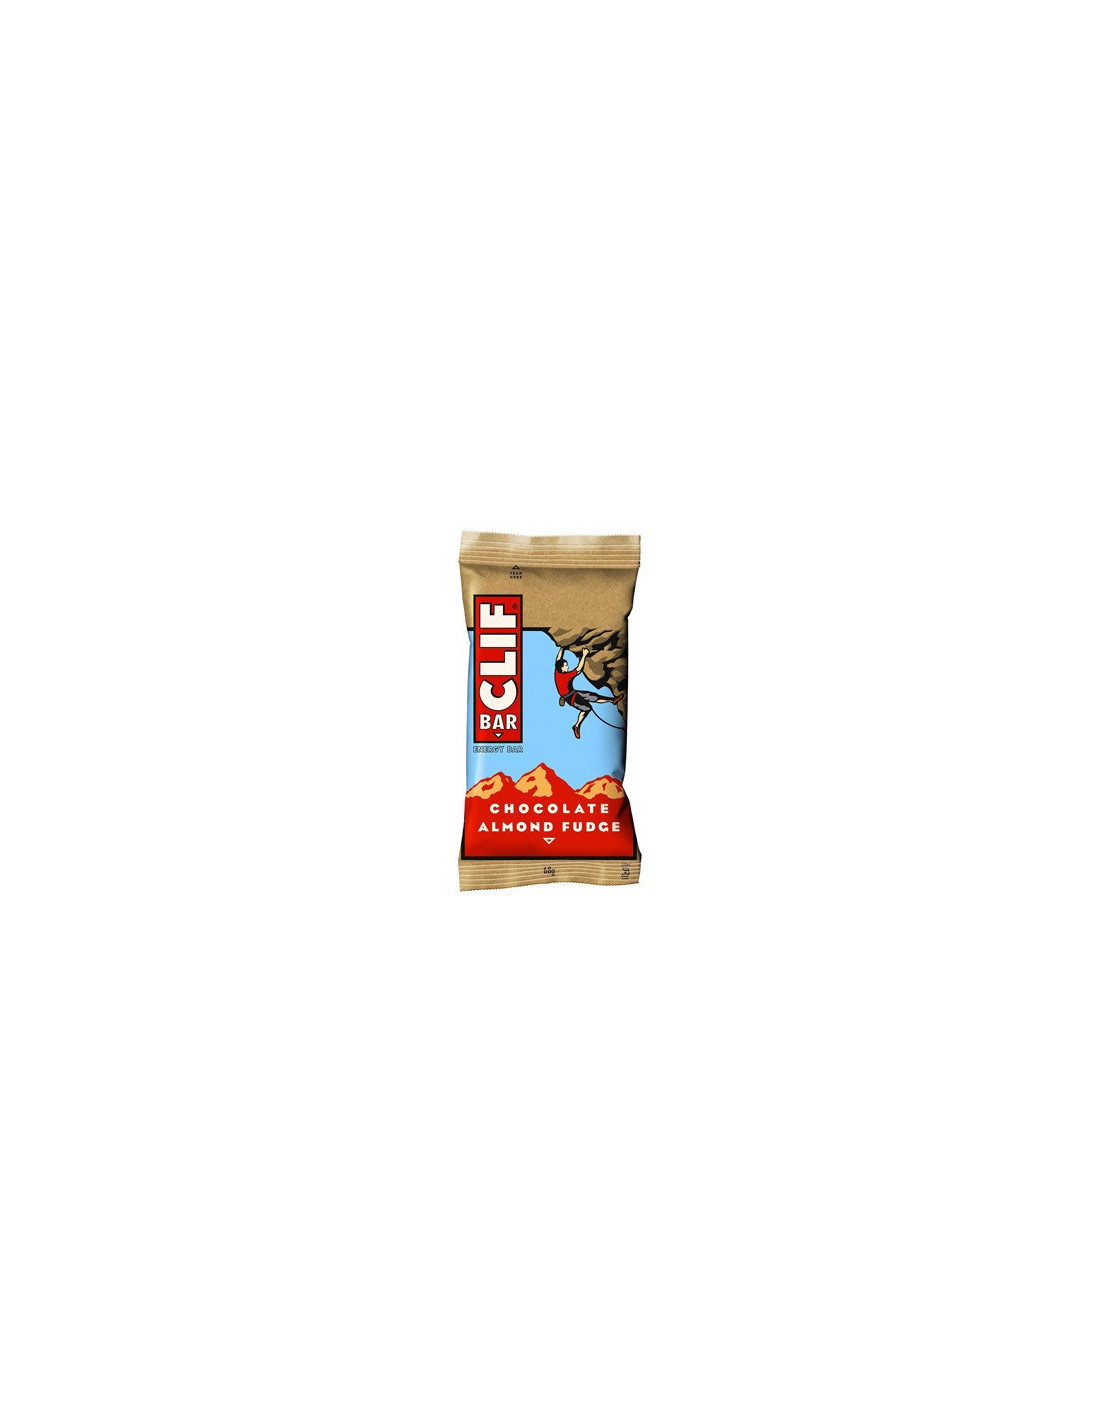 Clif Bar Chocolate Almond Fudge 68g Anwendung - Ausdauer/Kraft, Konsistenz - Rie